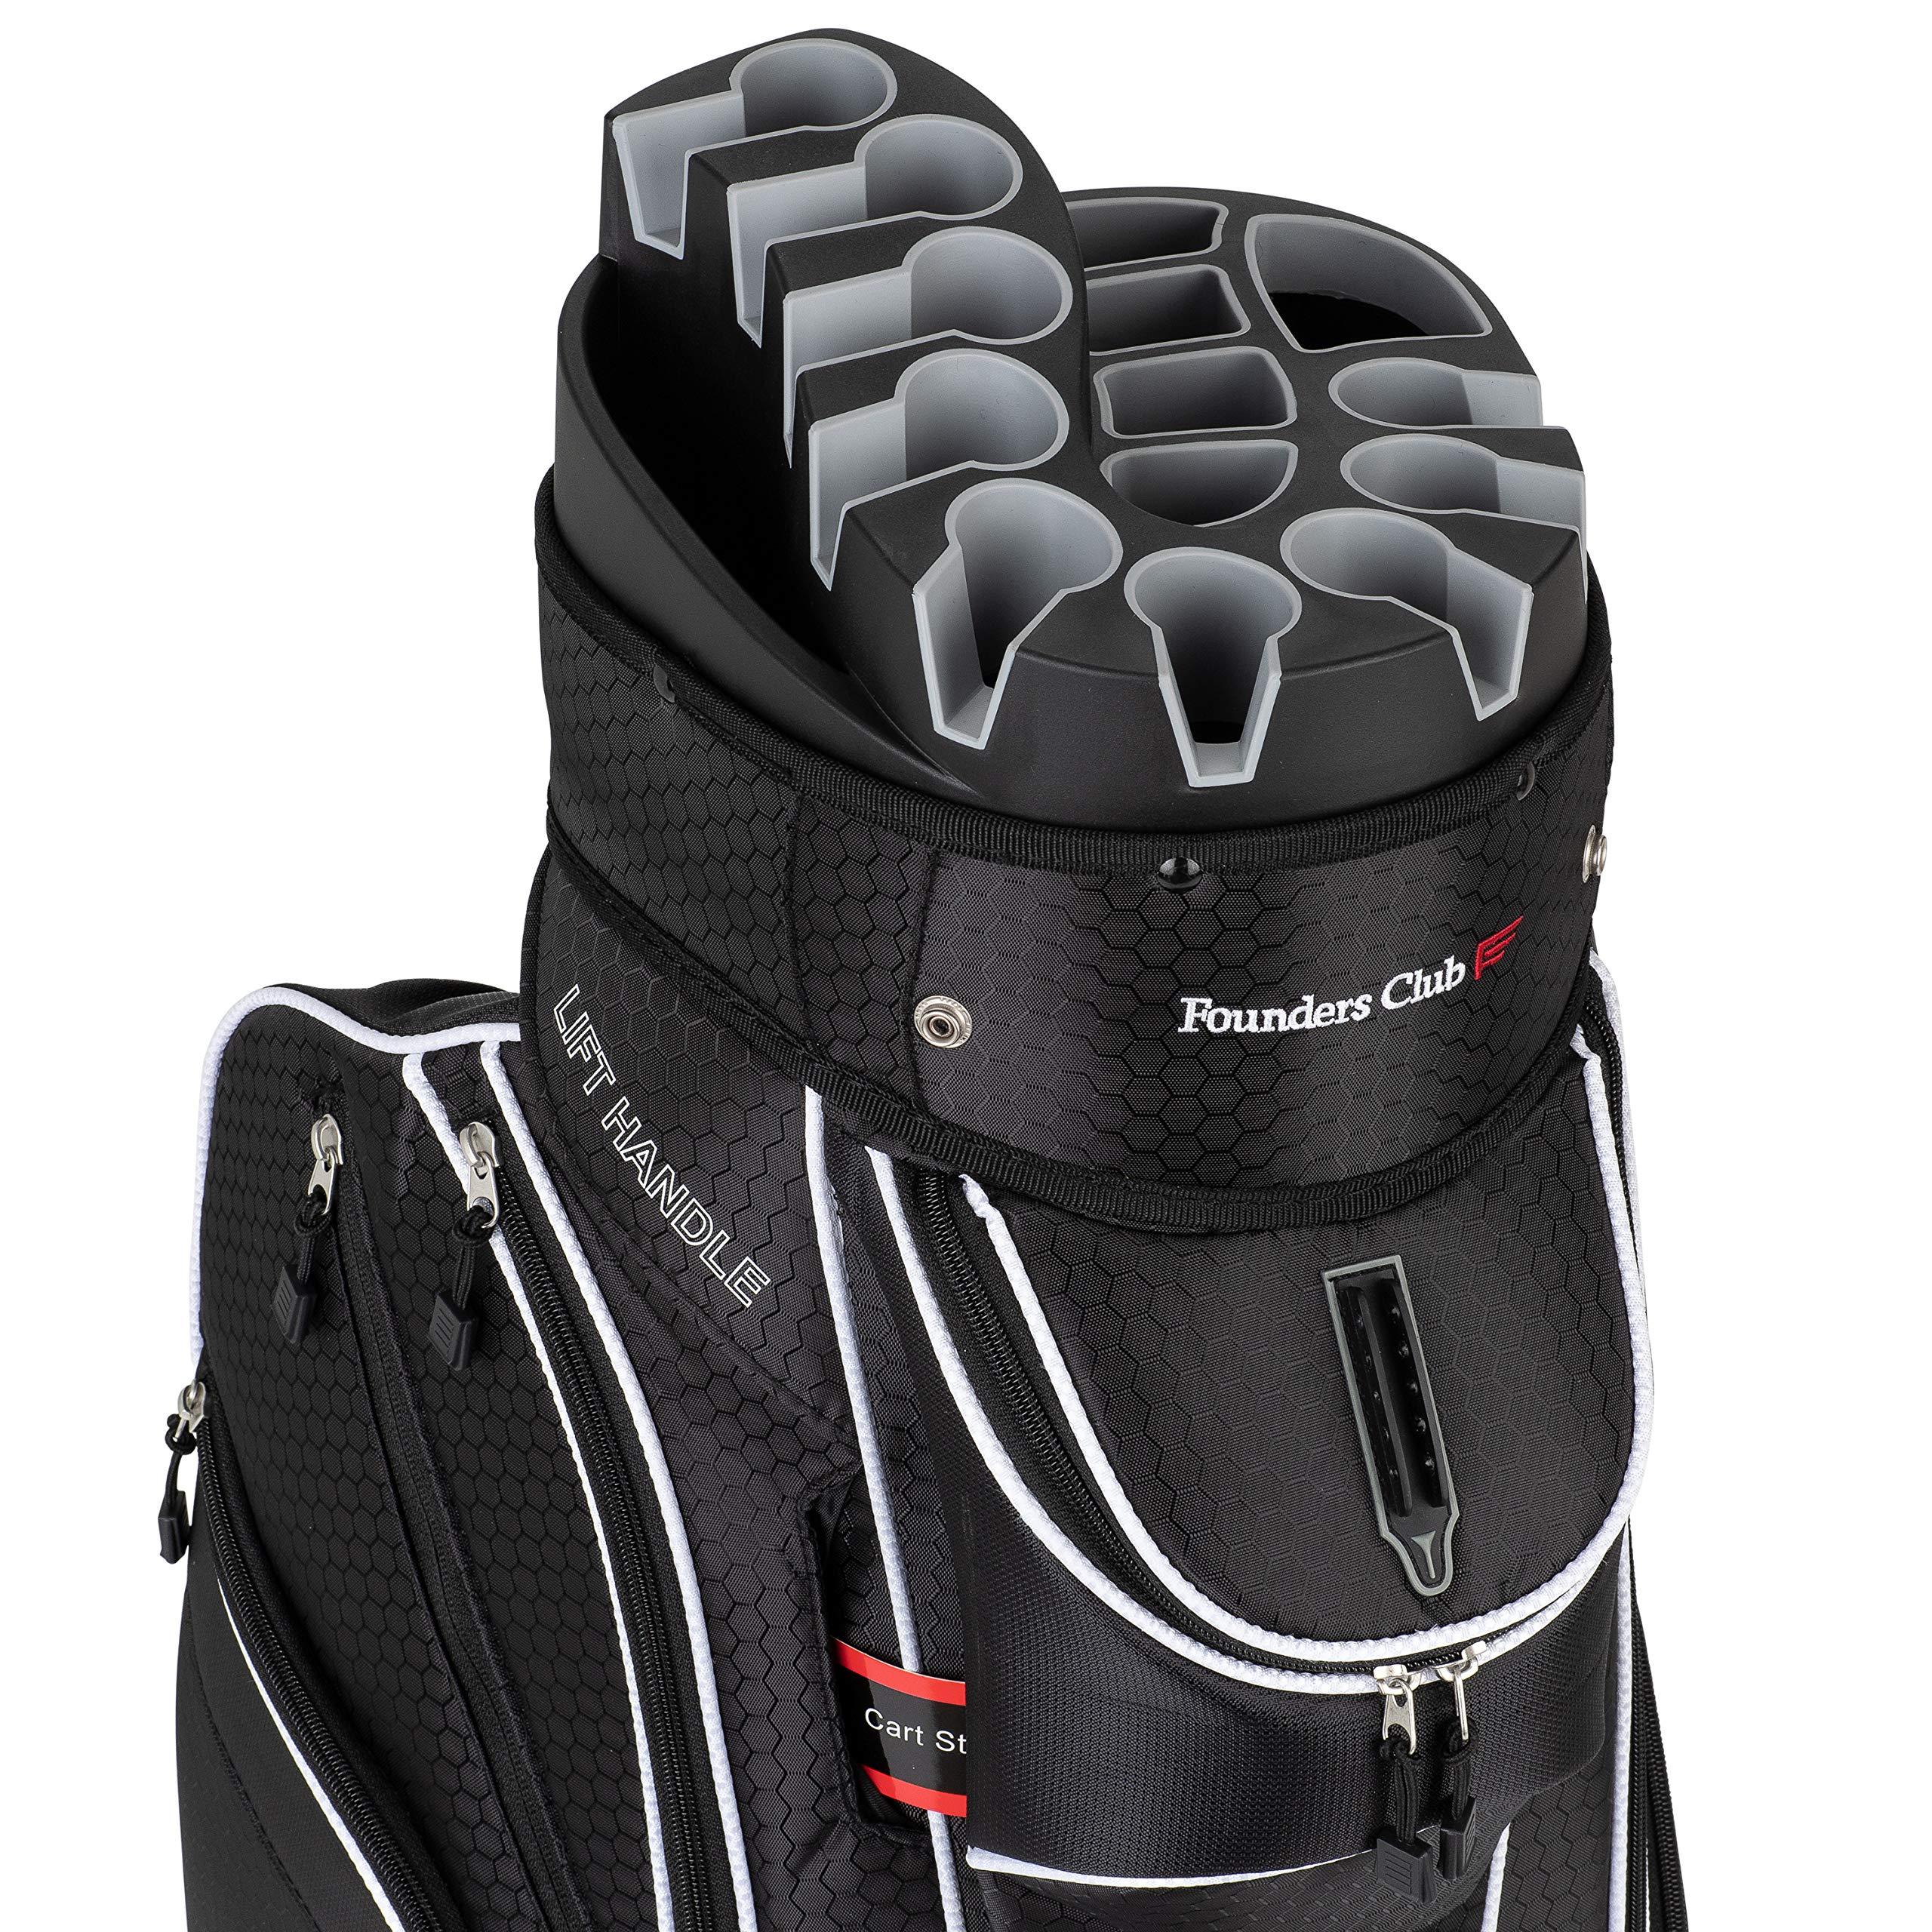 Founders Club Premium 14 Way Organizer Cart Bag (Black) by Founders Club